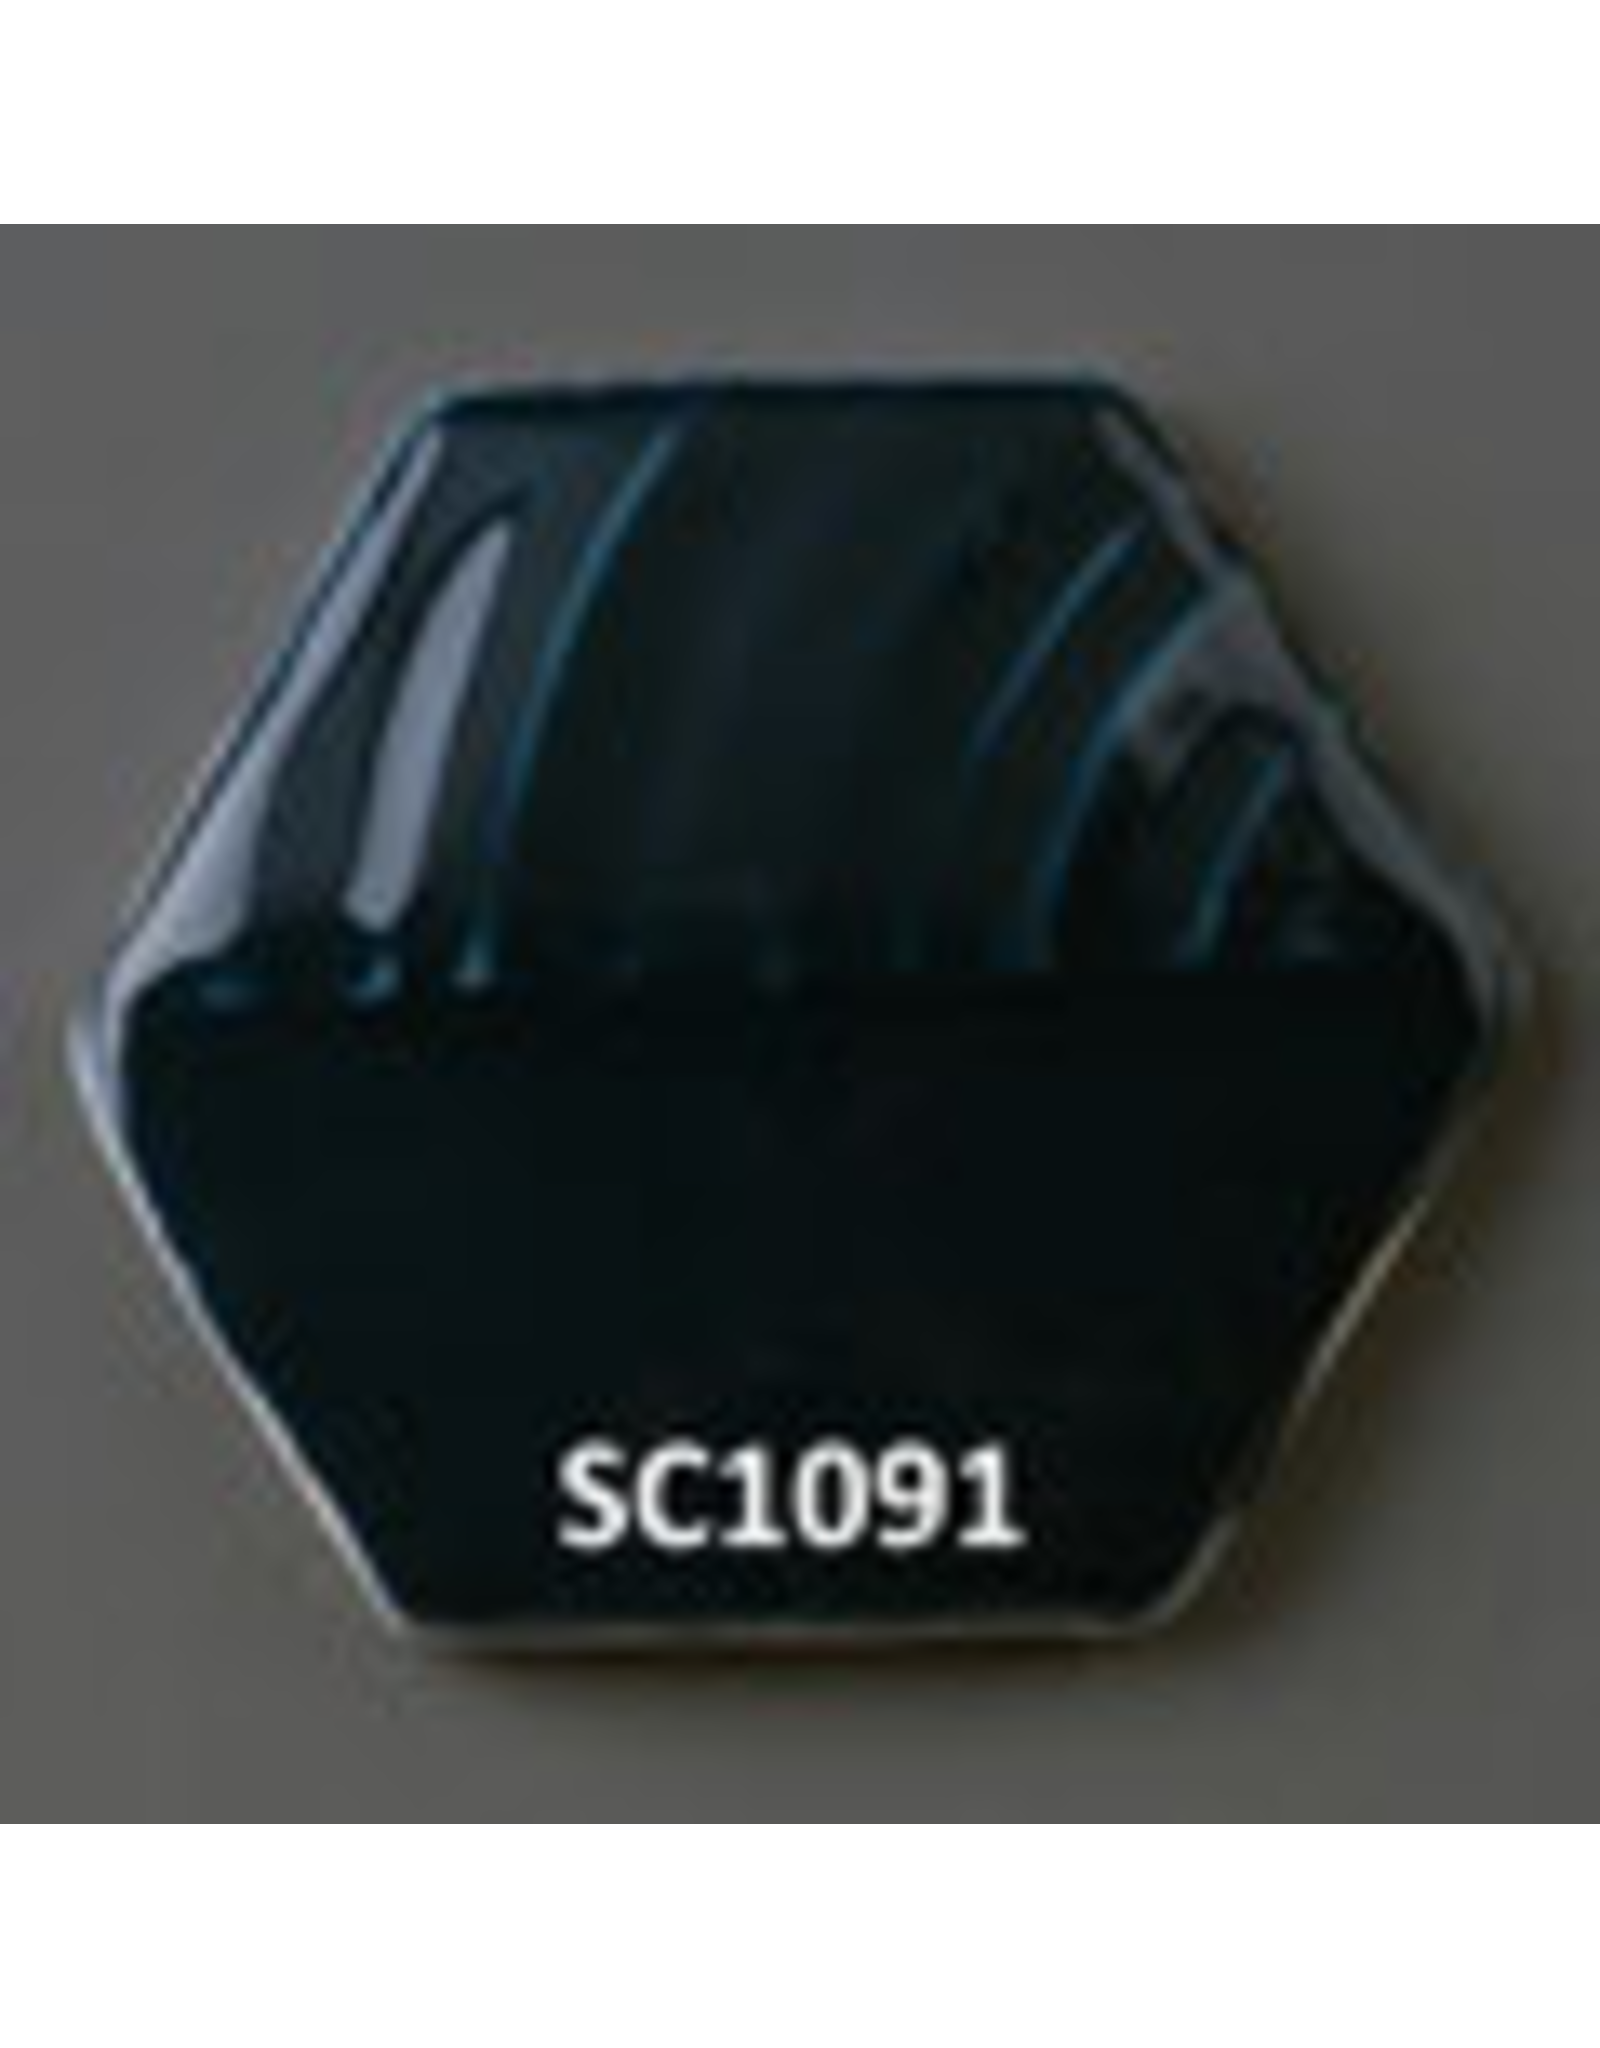 Sneyd Blue Green (Co,Cr,Zn,Al) Glaze Stain